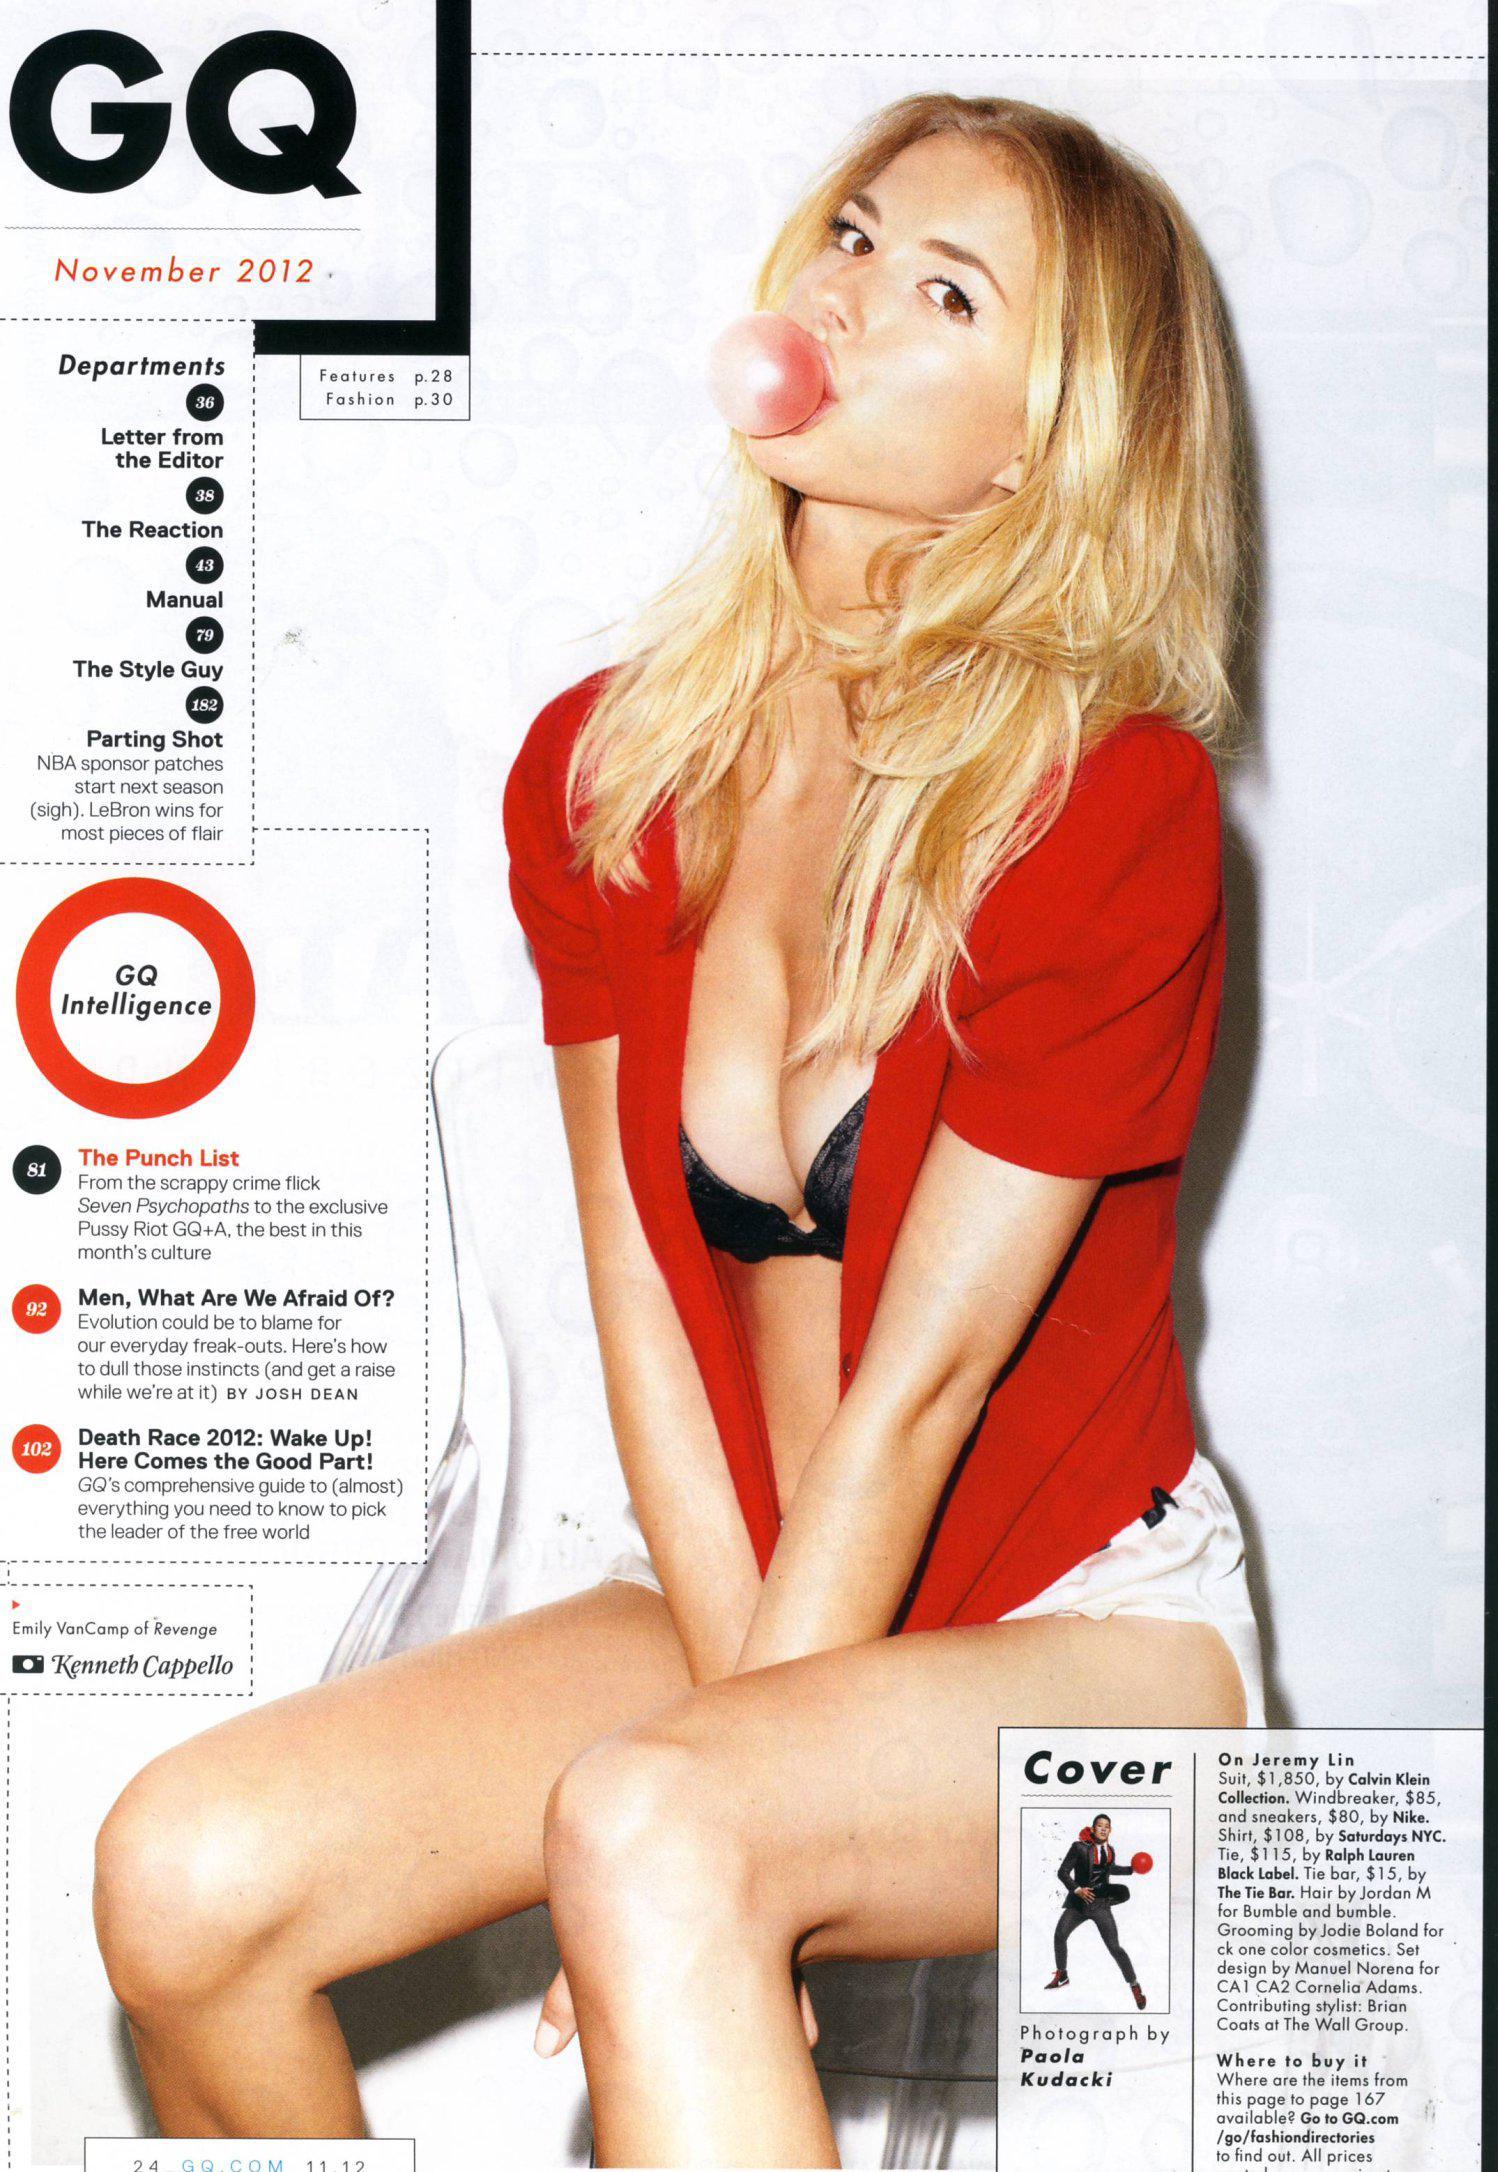 Emily VanCamp sin ropa interior